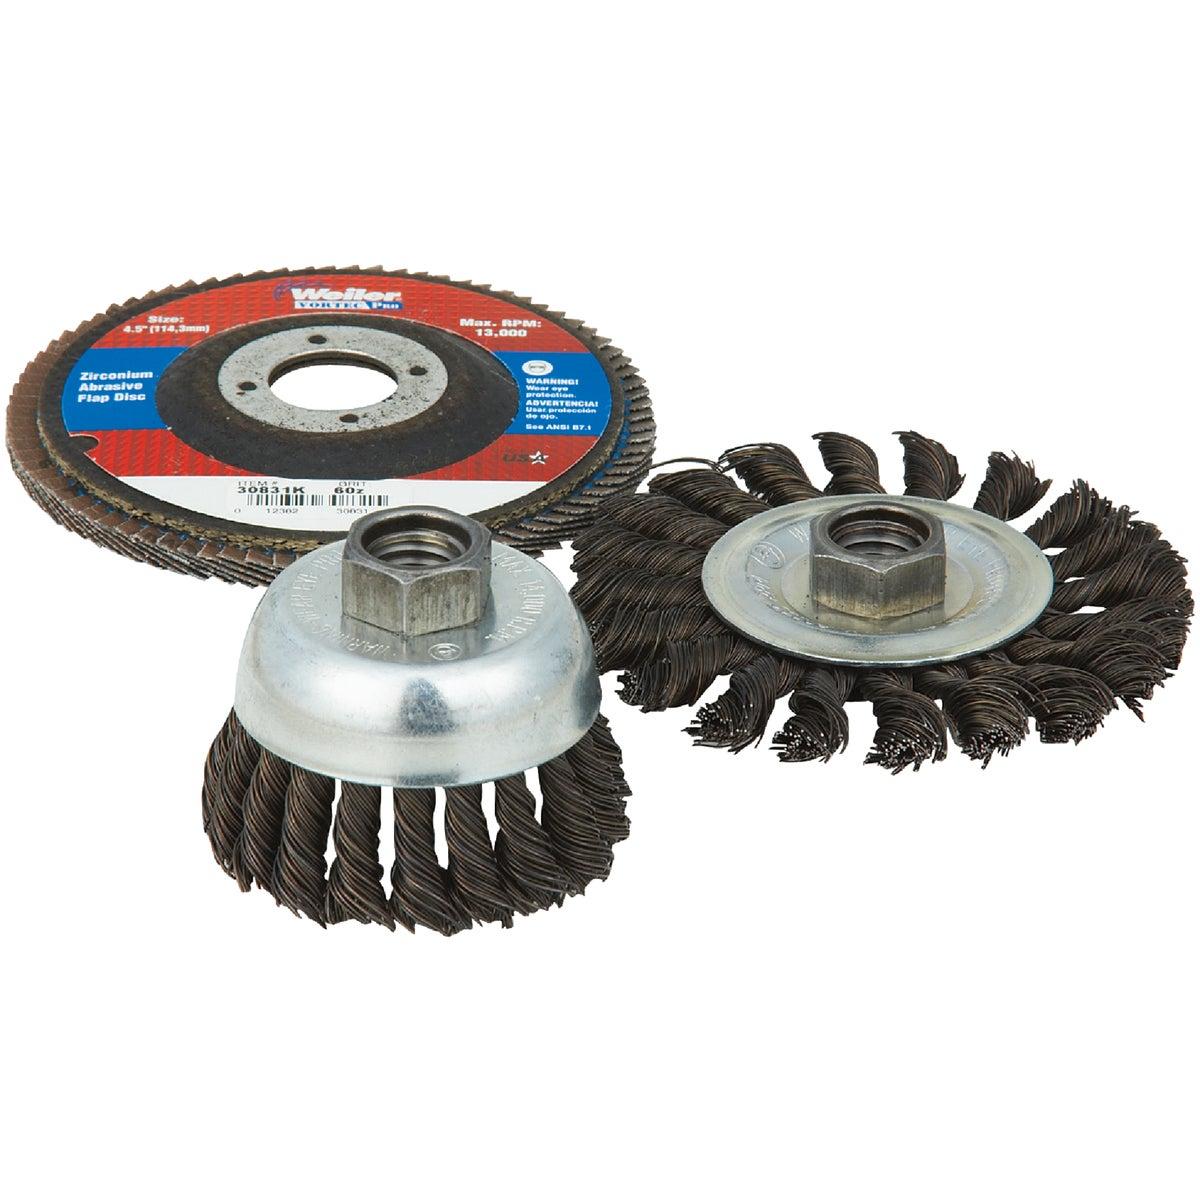 Weiler Brush 3PC MINI GRINDER KIT 36099